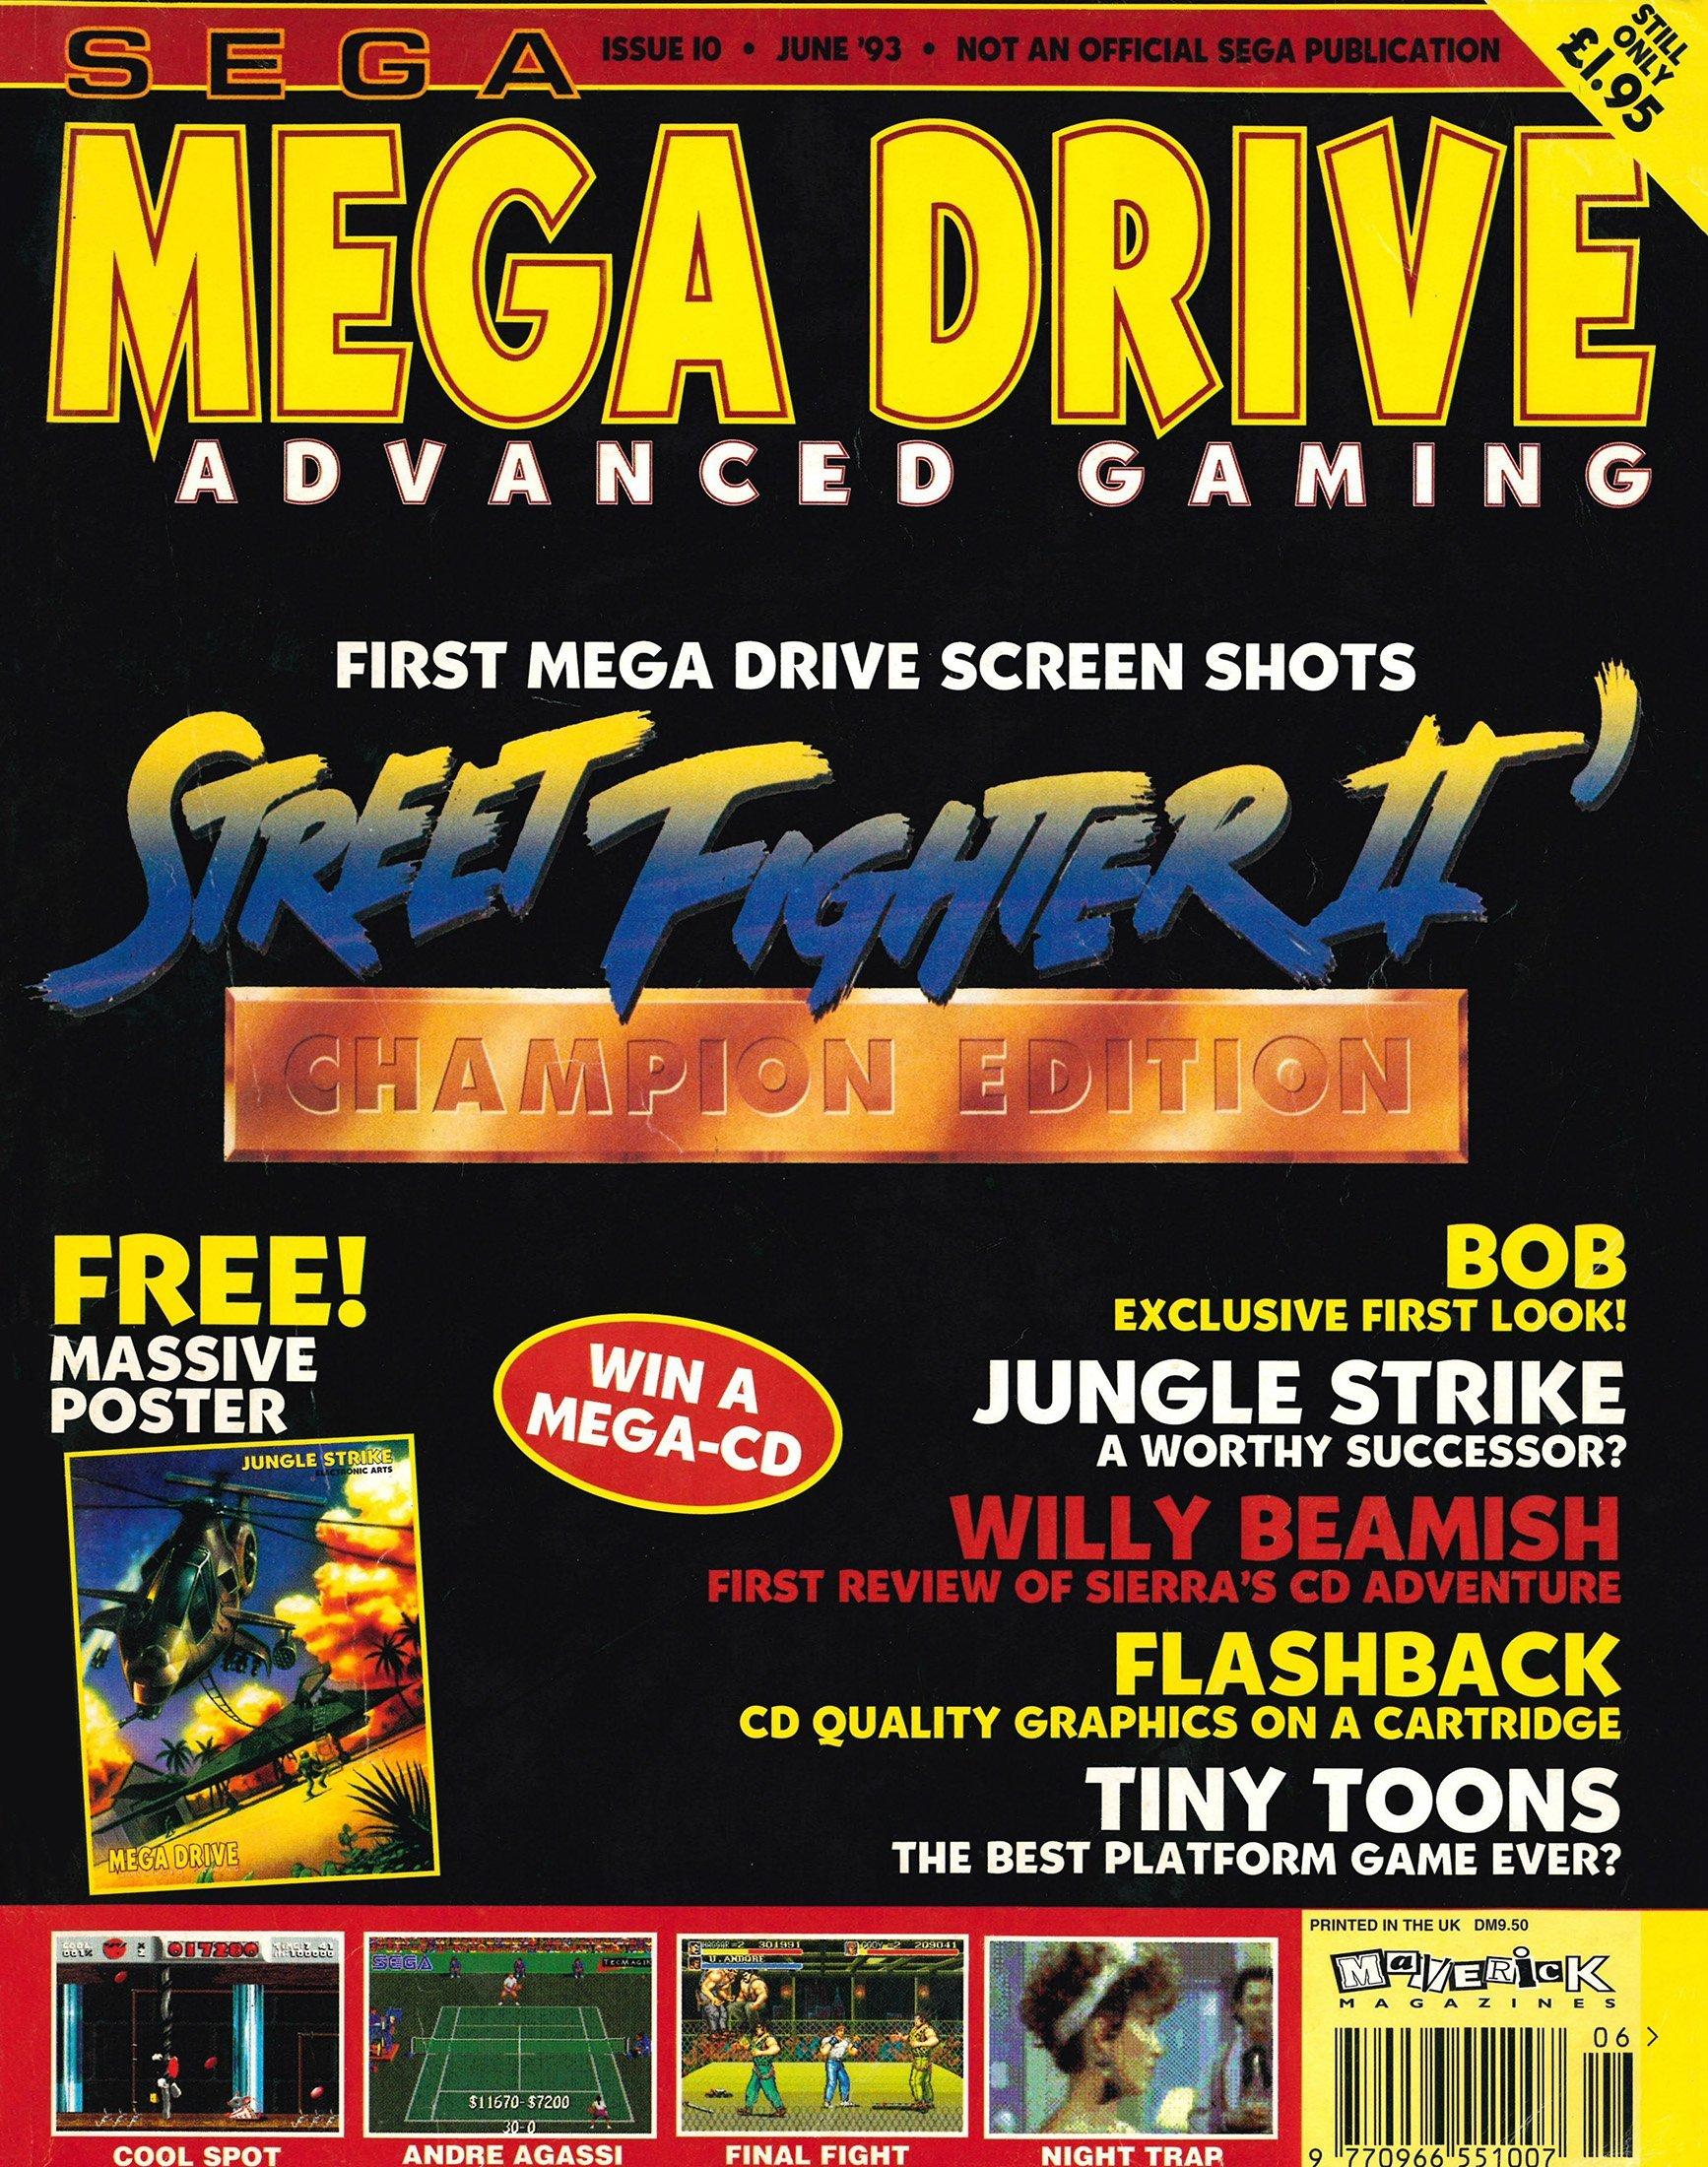 Mega Drive Advanced Gaming 10 (June 1993)